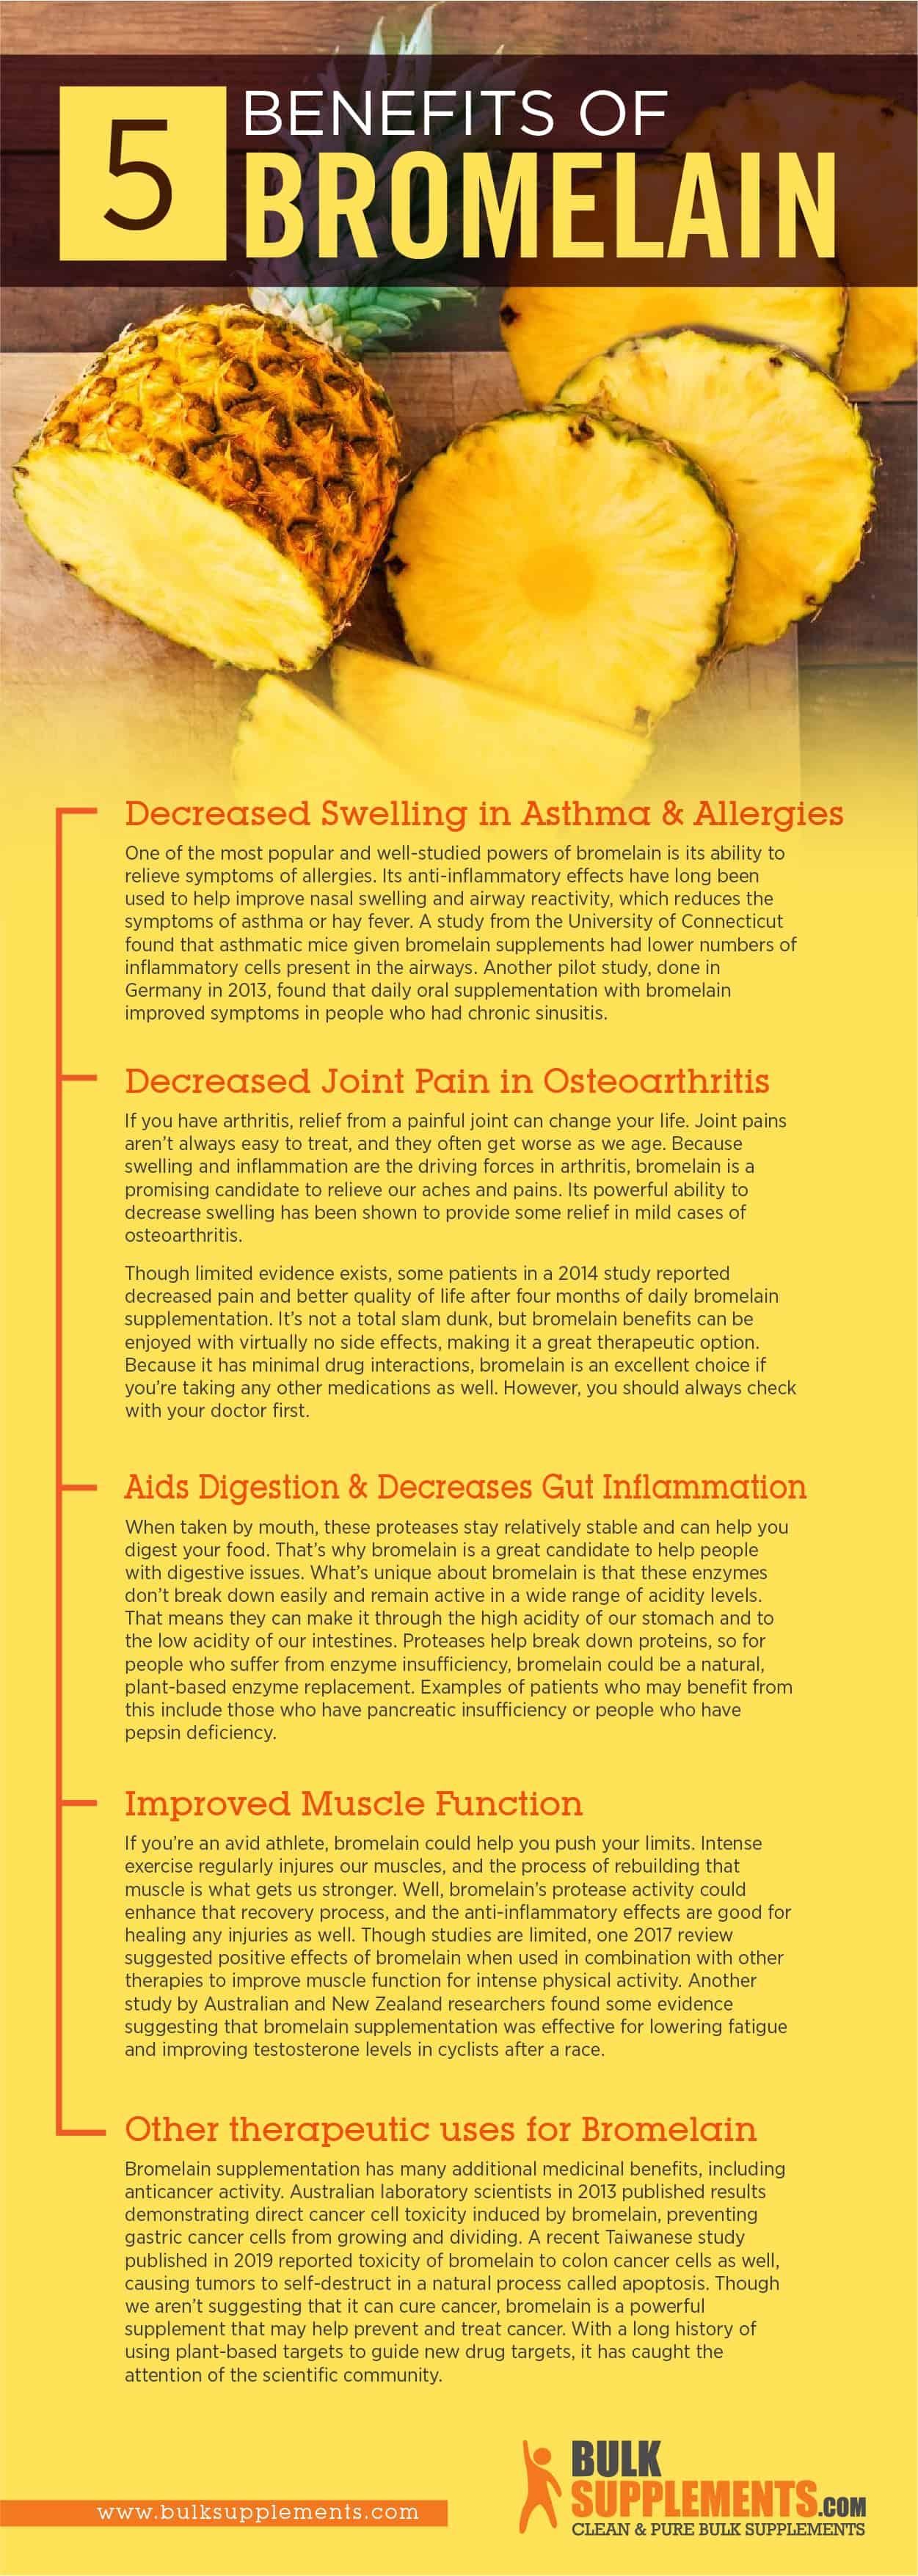 Bromelain benefits infographic